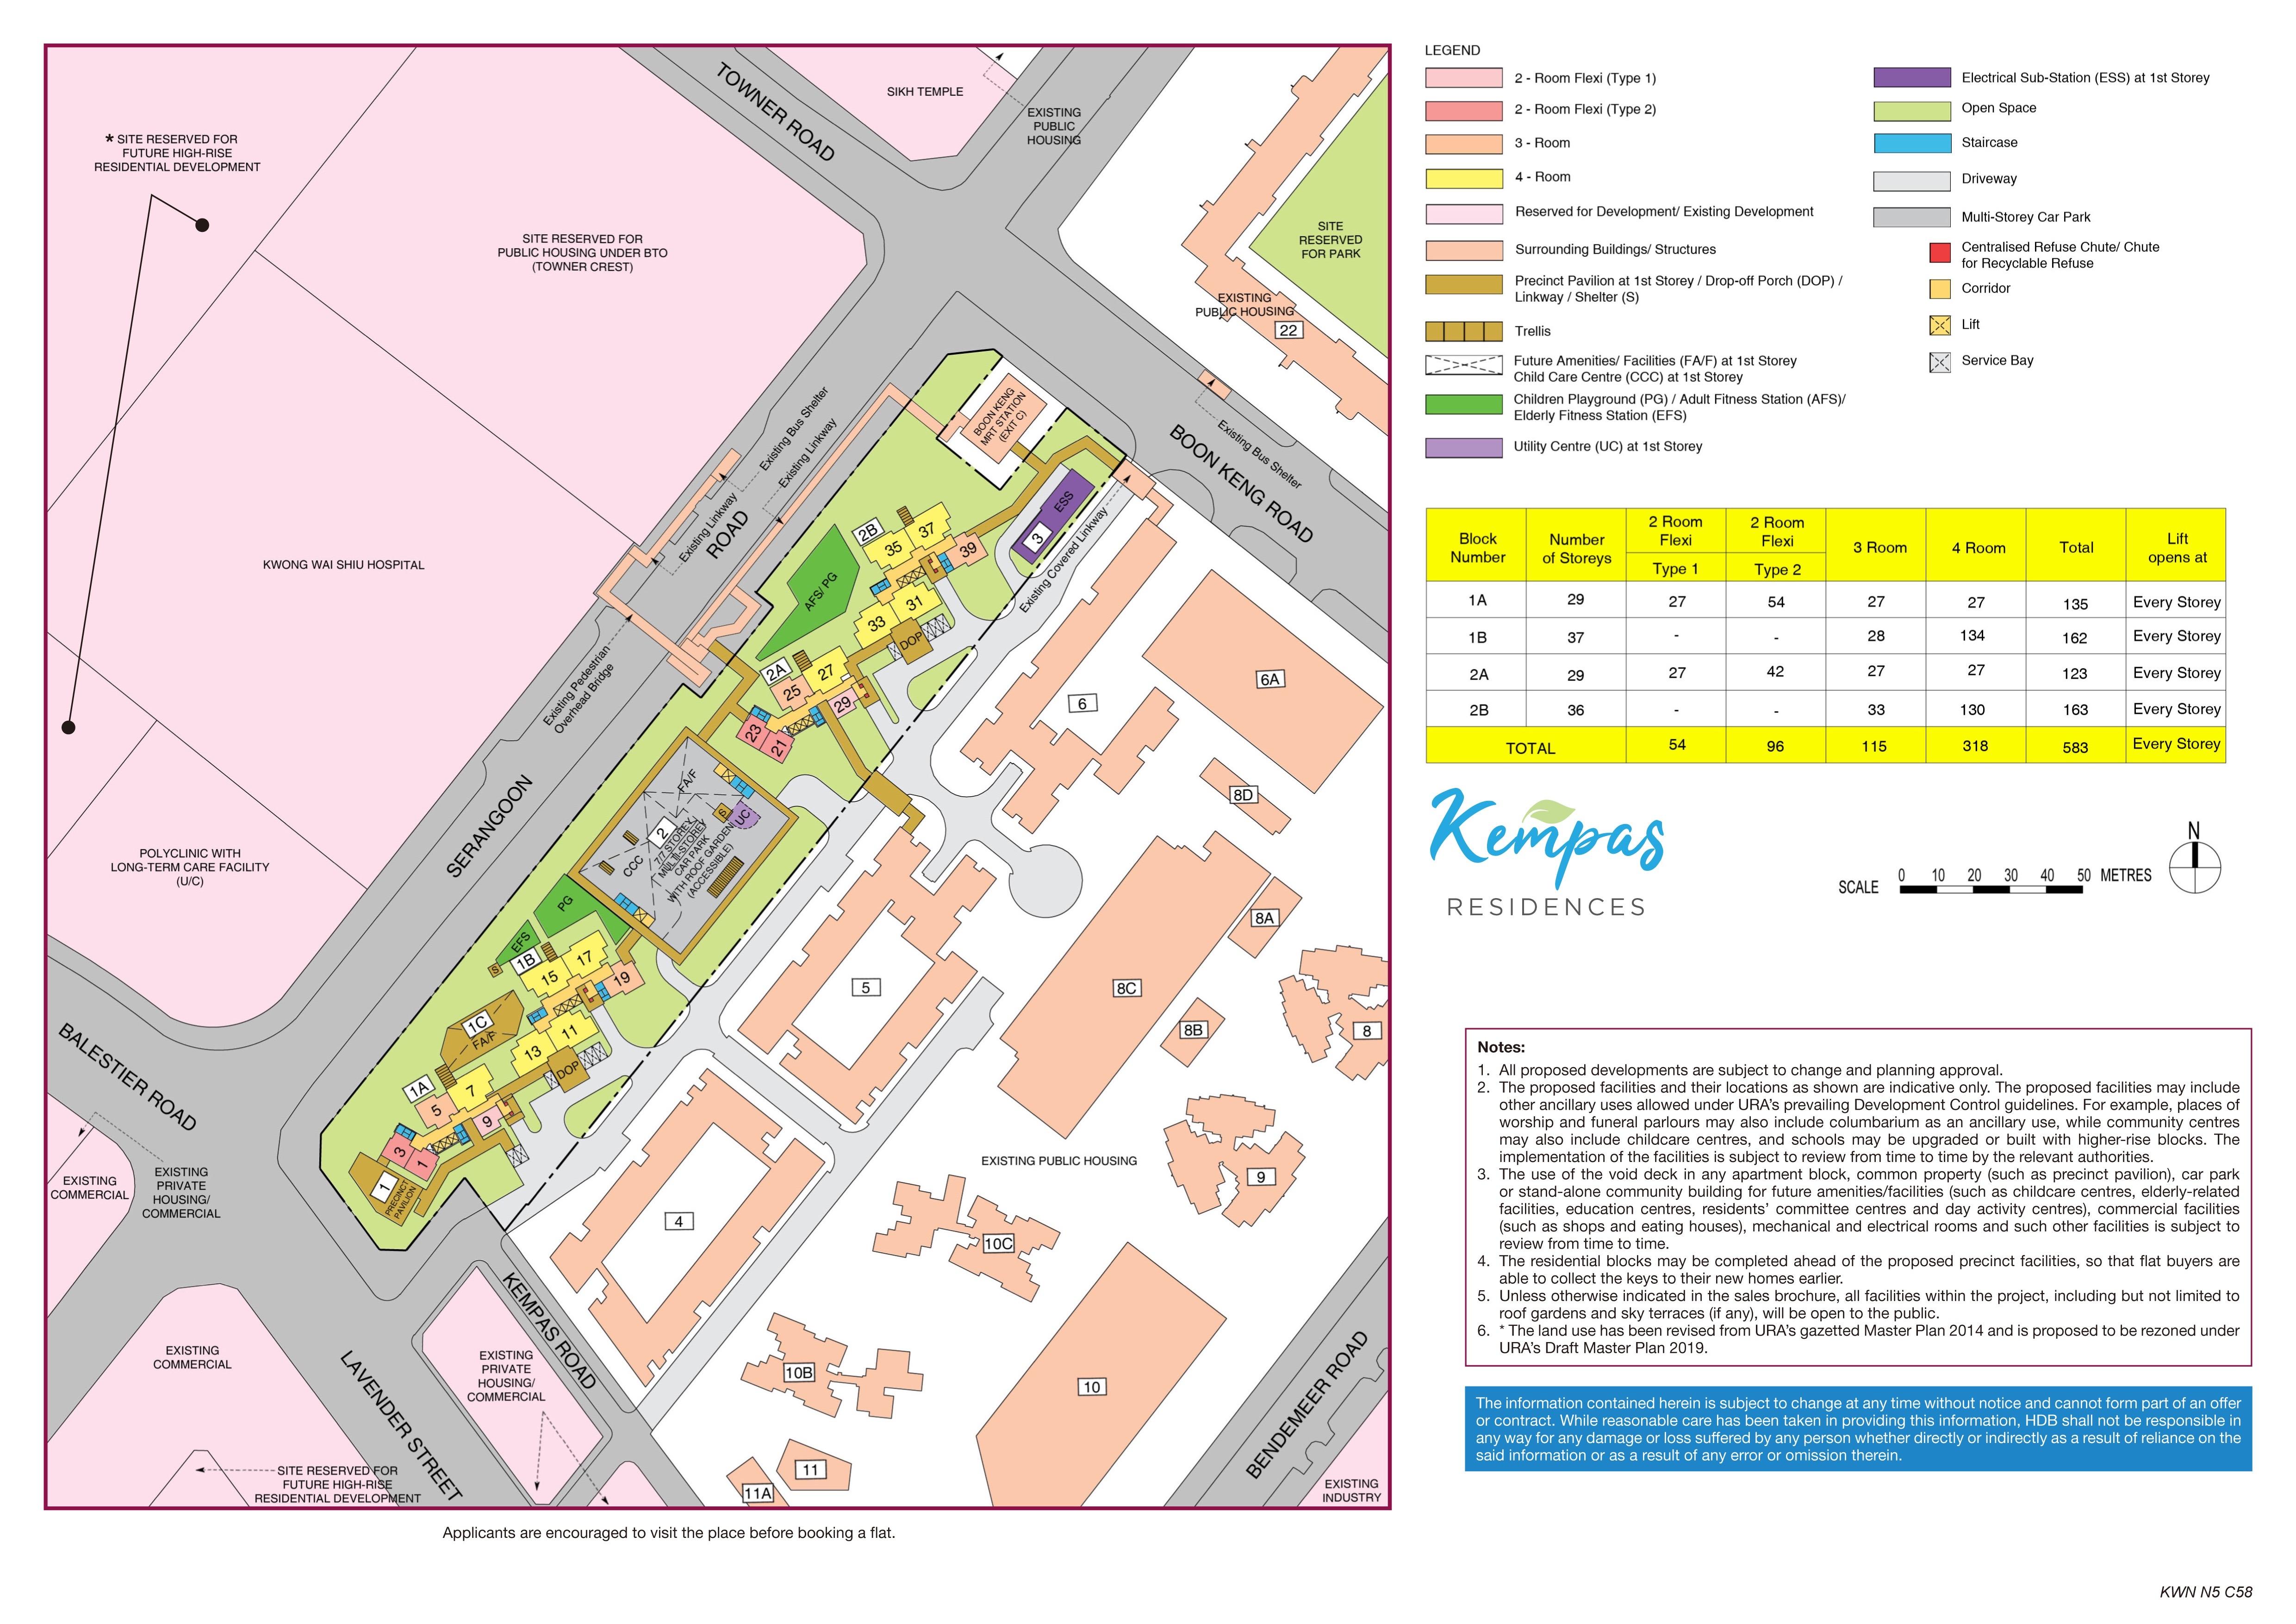 Kempas Residences Site Plan